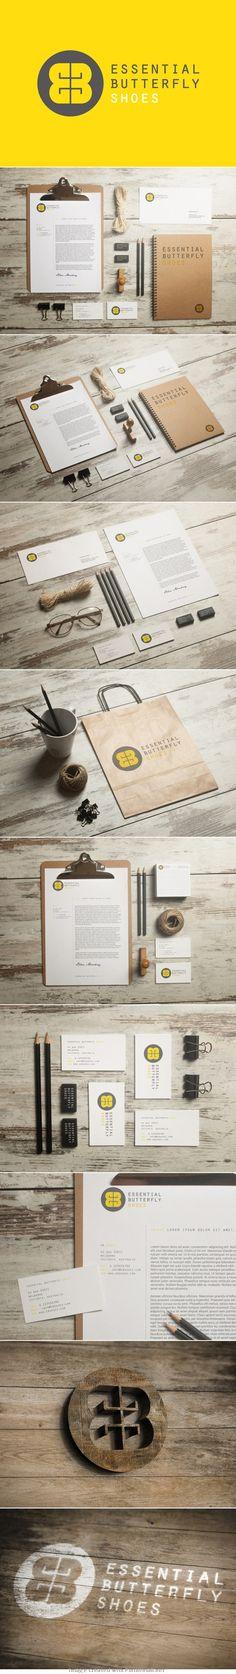 Photography Studio Logo Visual Identity Ideas For 2019 Brand Identity Design, Graphic Design Branding, Corporate Design, Business Design, Typography Design, Logo Design, Corporate Identity, Identity Branding, Design Art